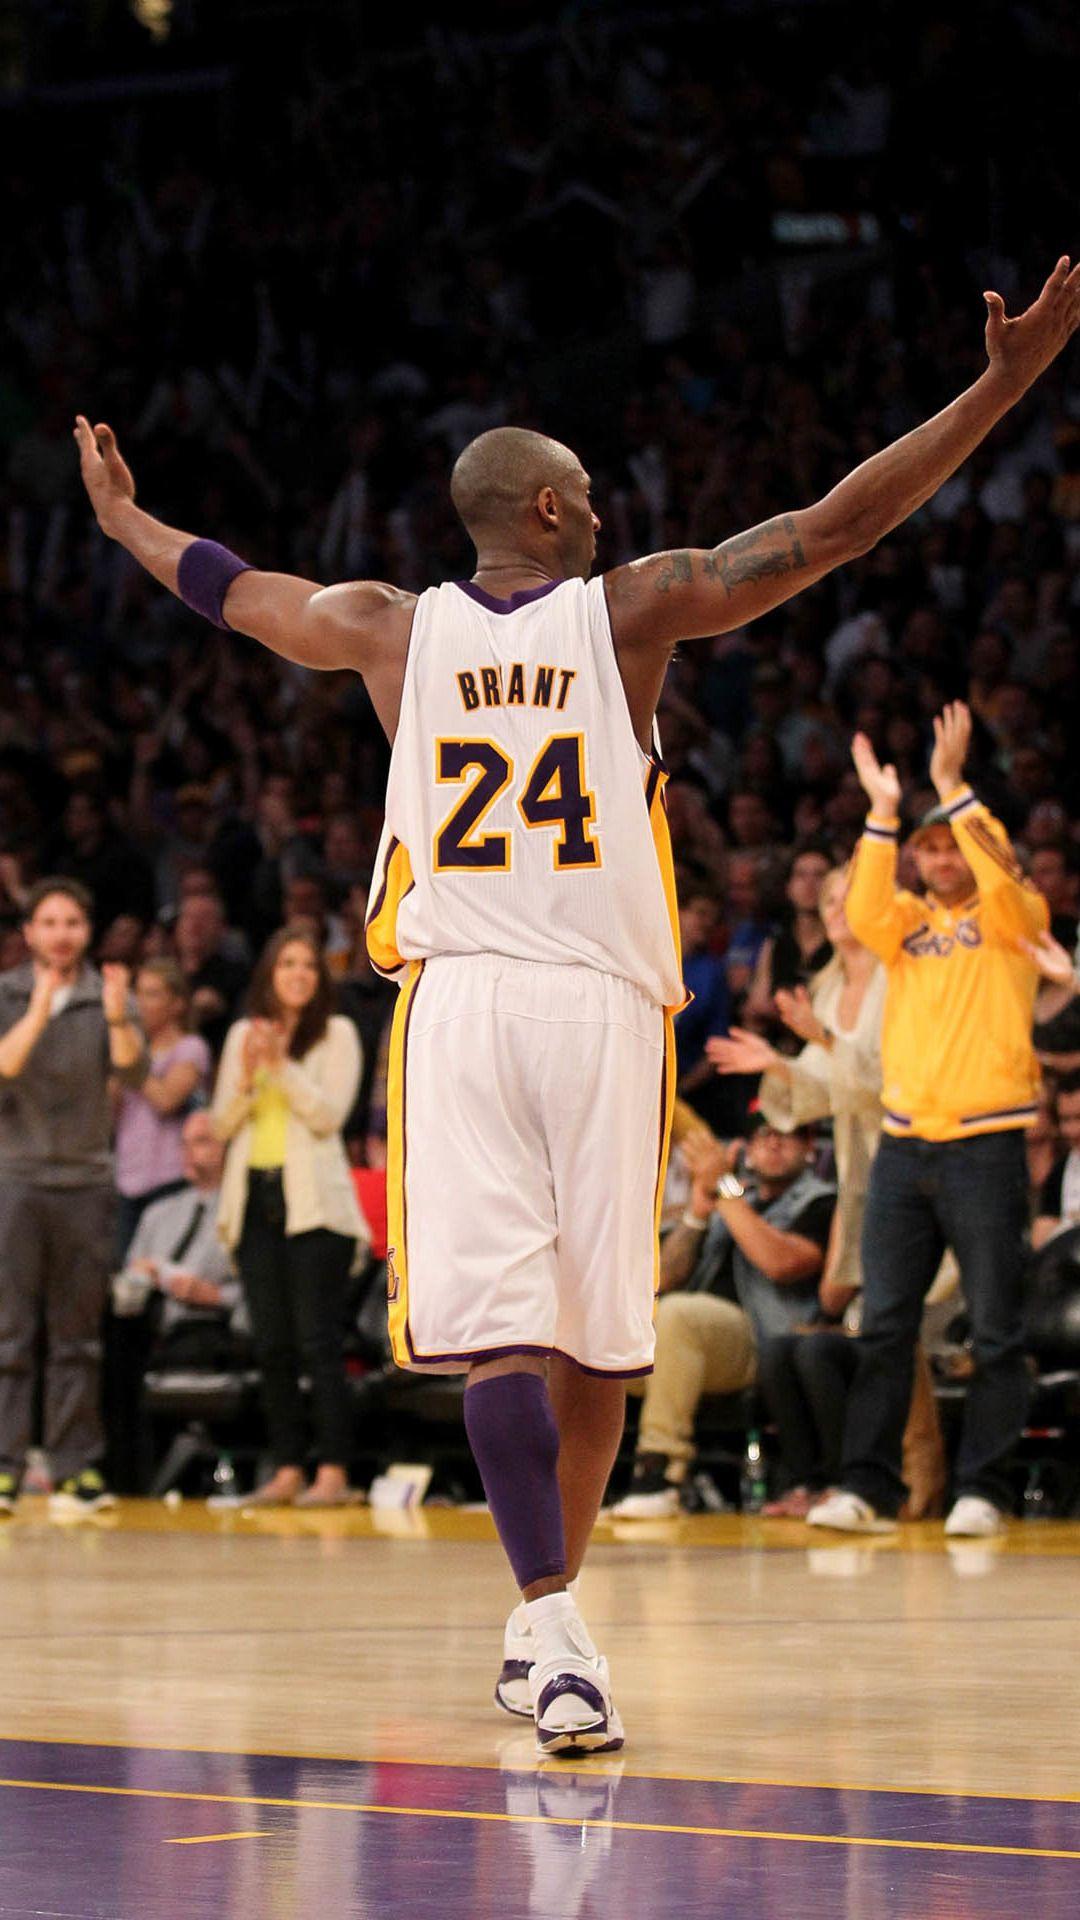 Bryant Kobe Nba Sports Super Star Arena Sucess Cheer Iphone 6 Wallpaper Download Iphone Wallpapers Kobe Bryant Wallpaper Kobe Bryant Kobe Bryant Black Mamba